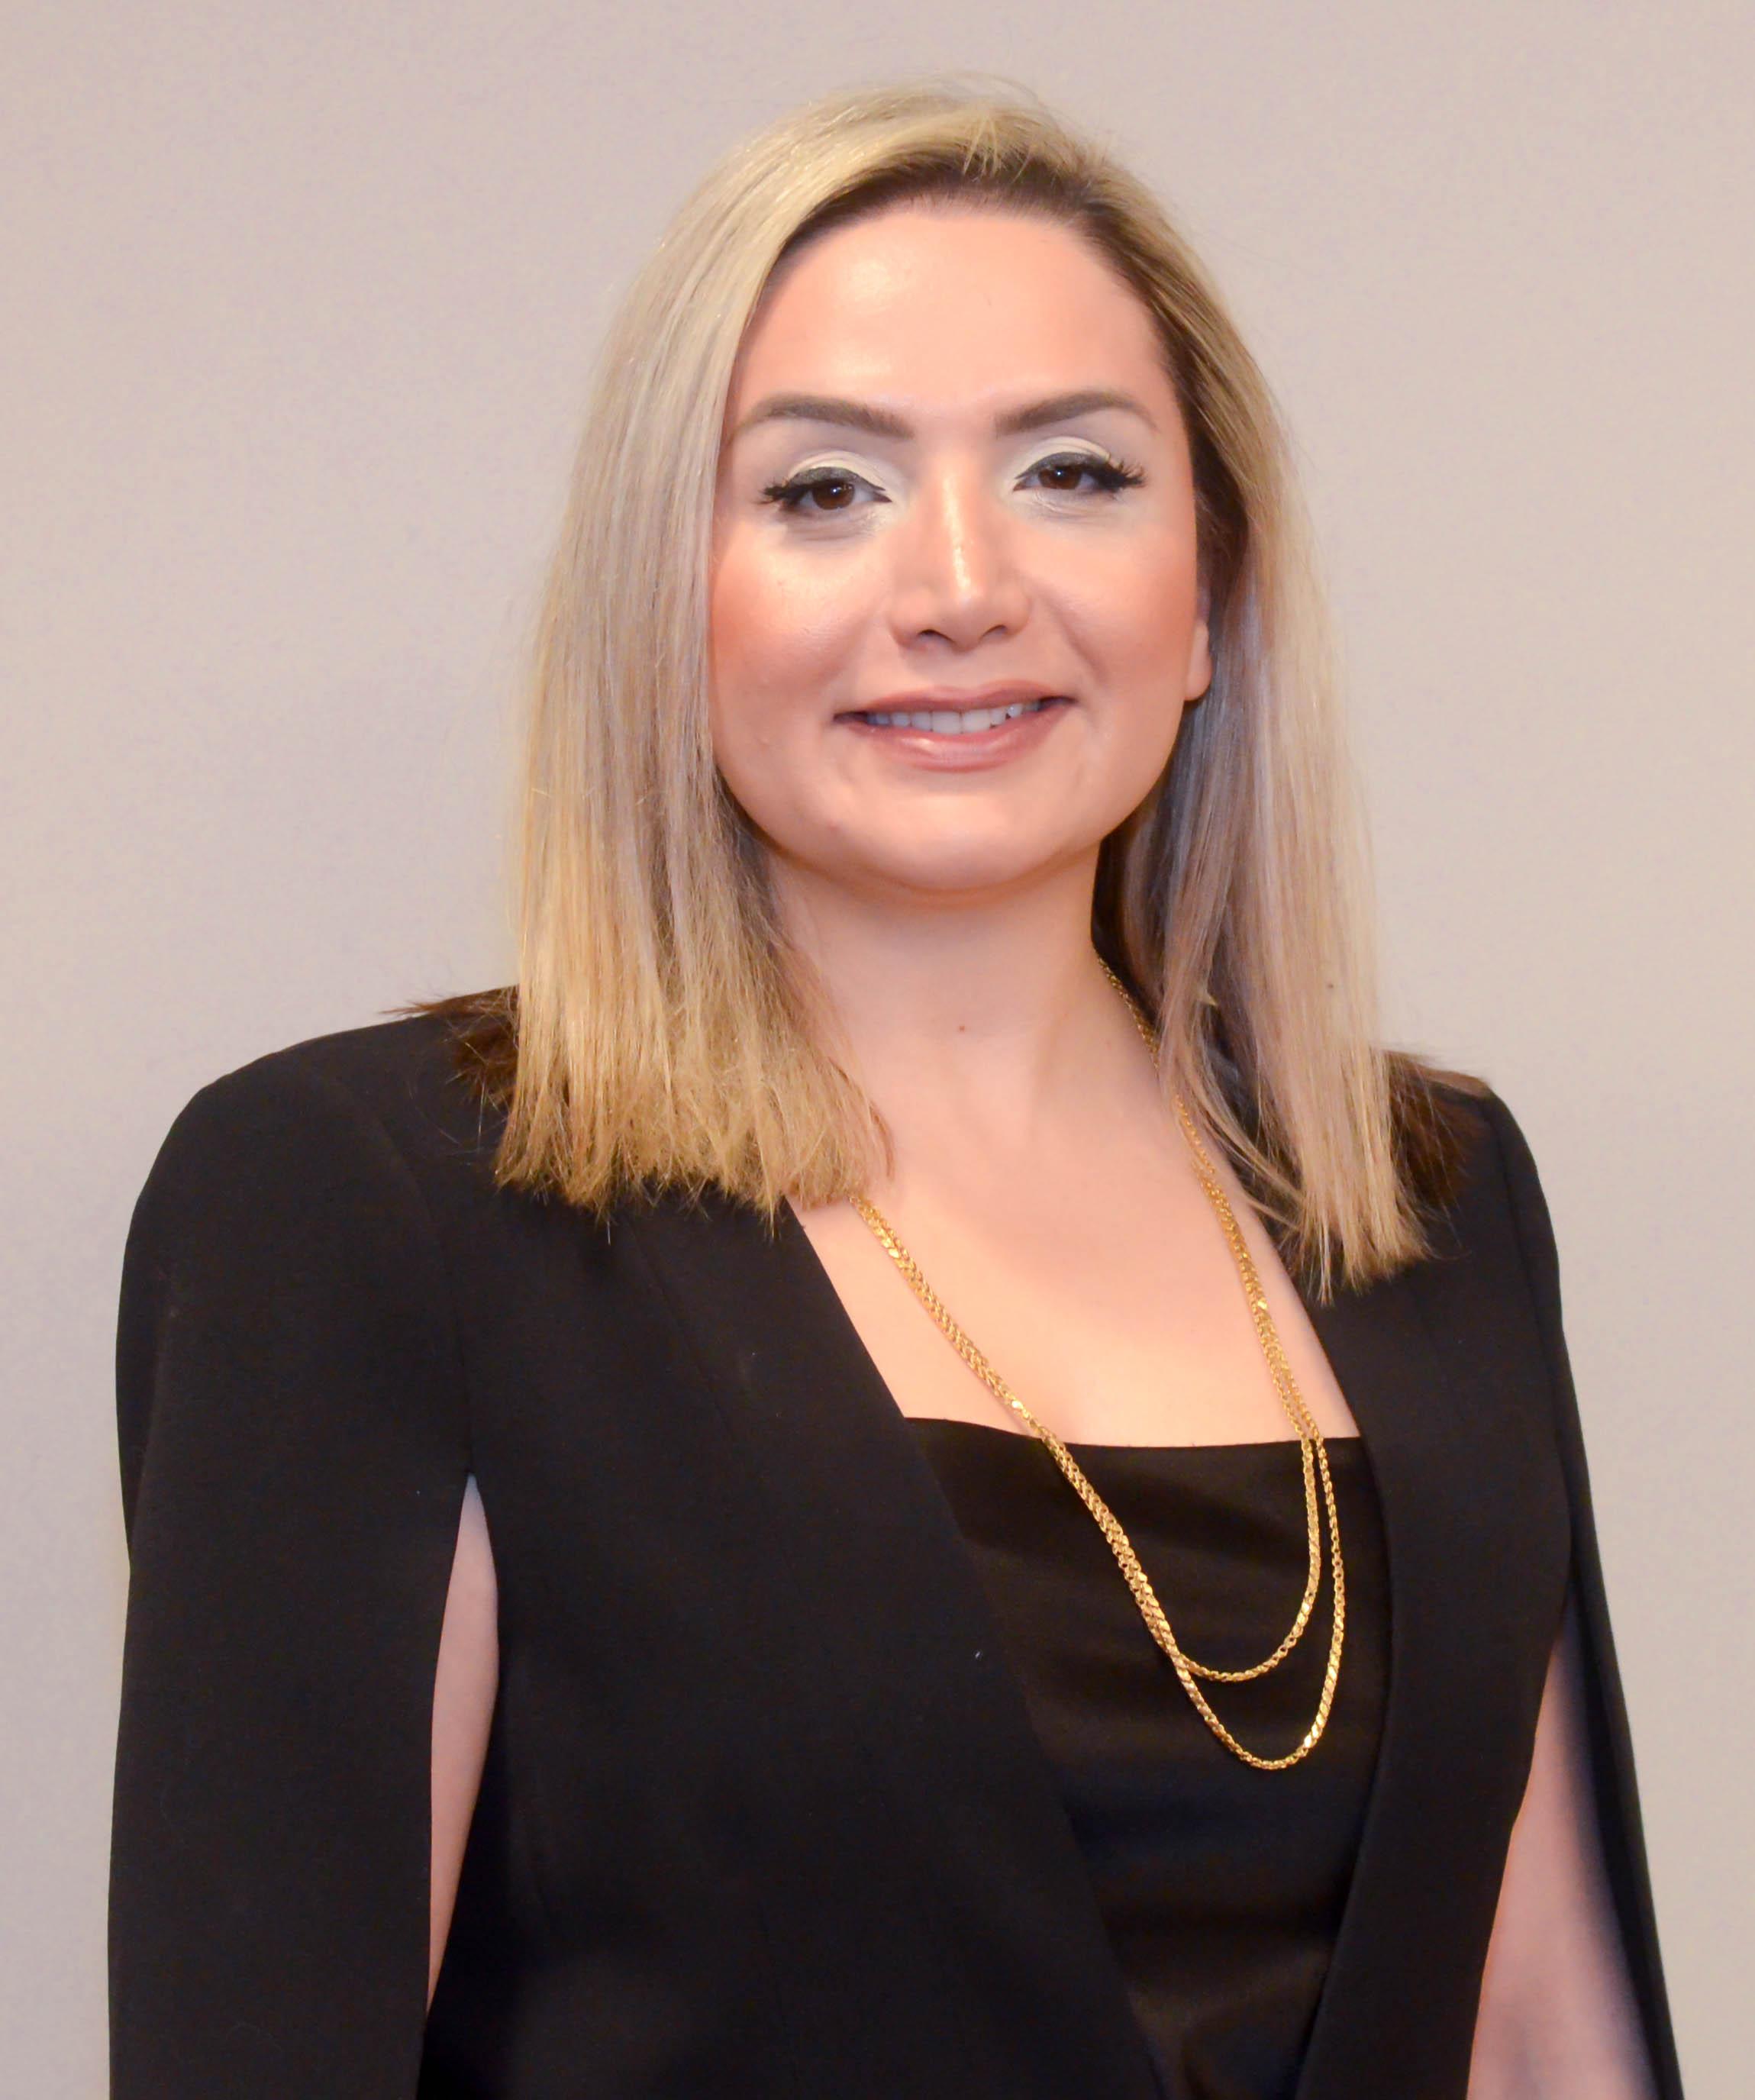 Dr. Maryam Rivaz